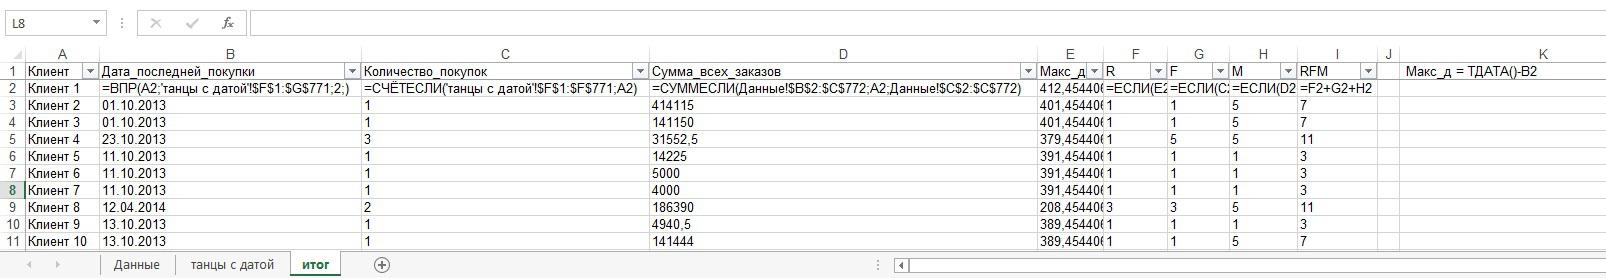 RFM-анализ на коленке (Excel) - 3